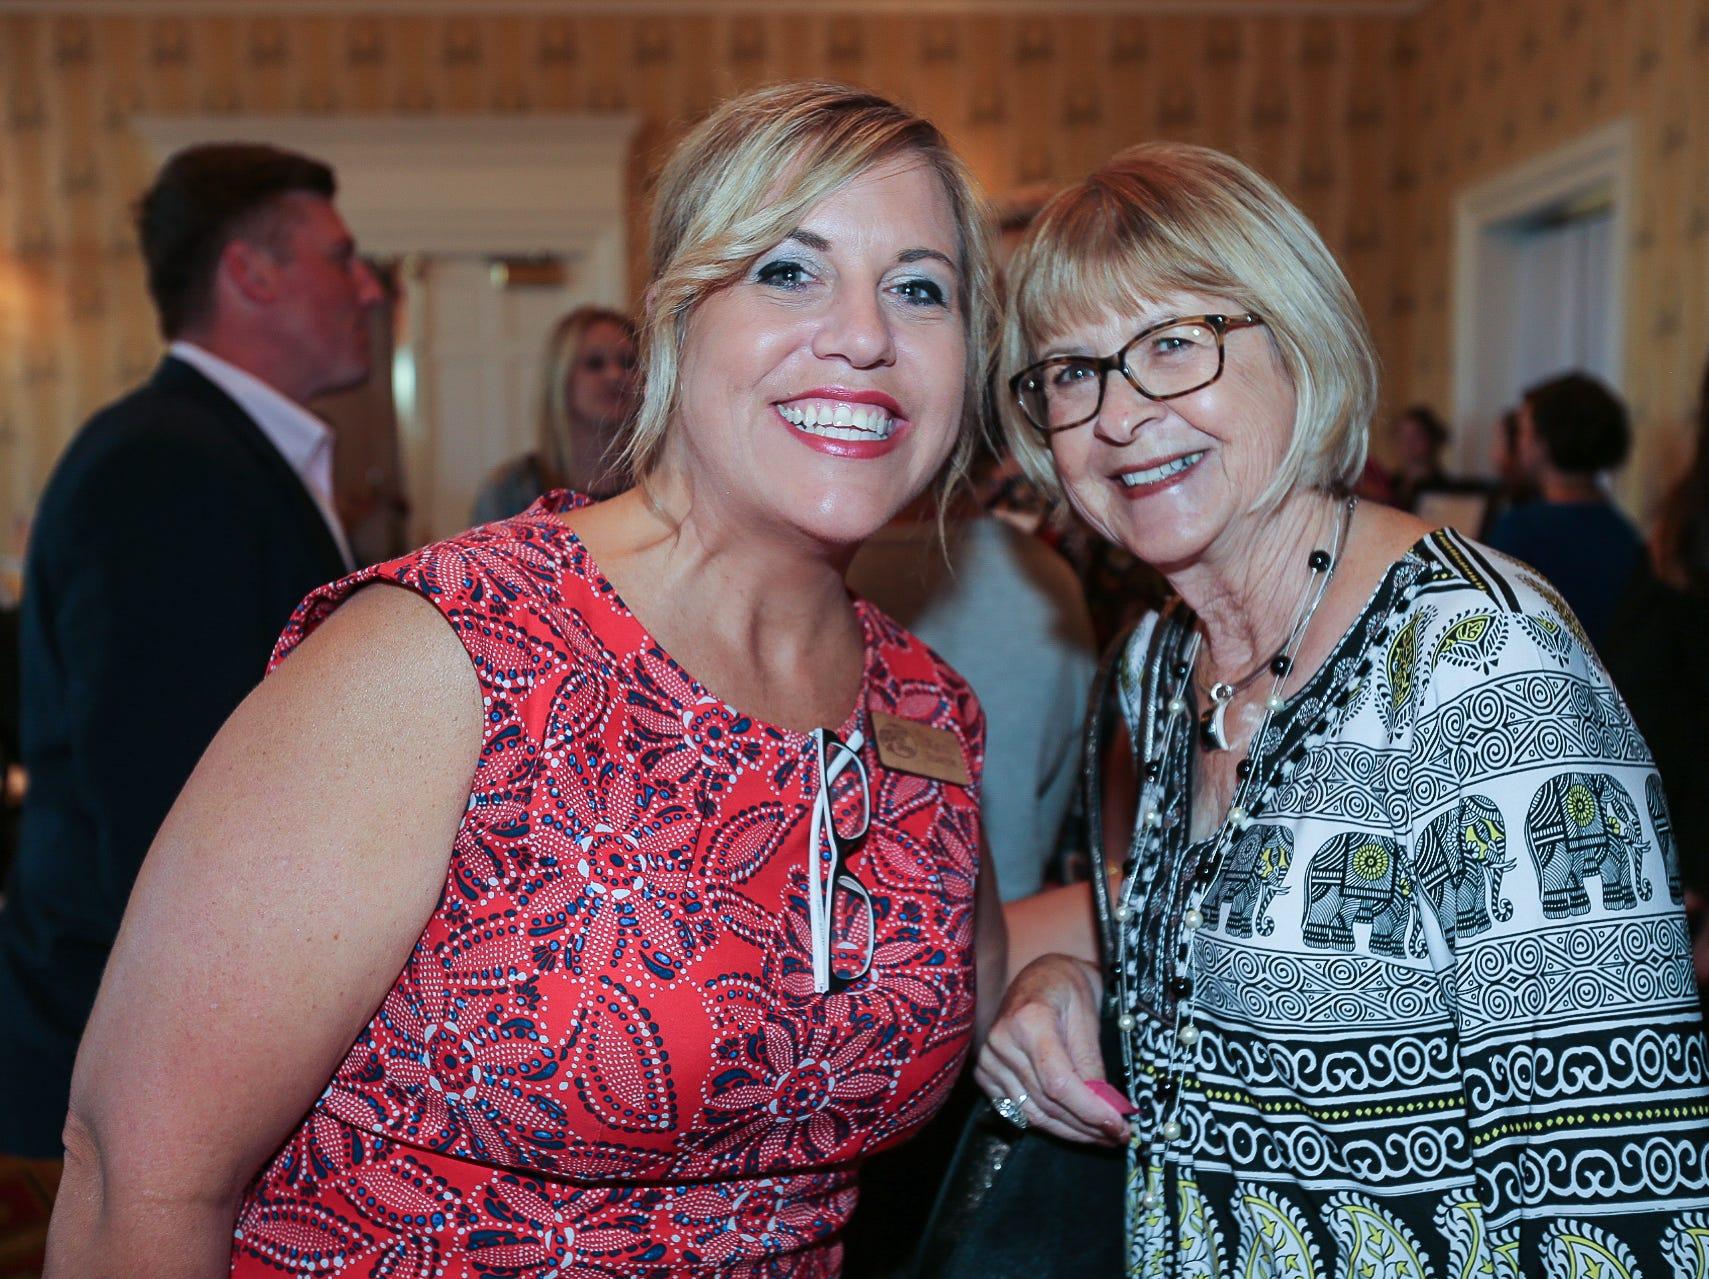 Keri Buatte and Sharon Cotton